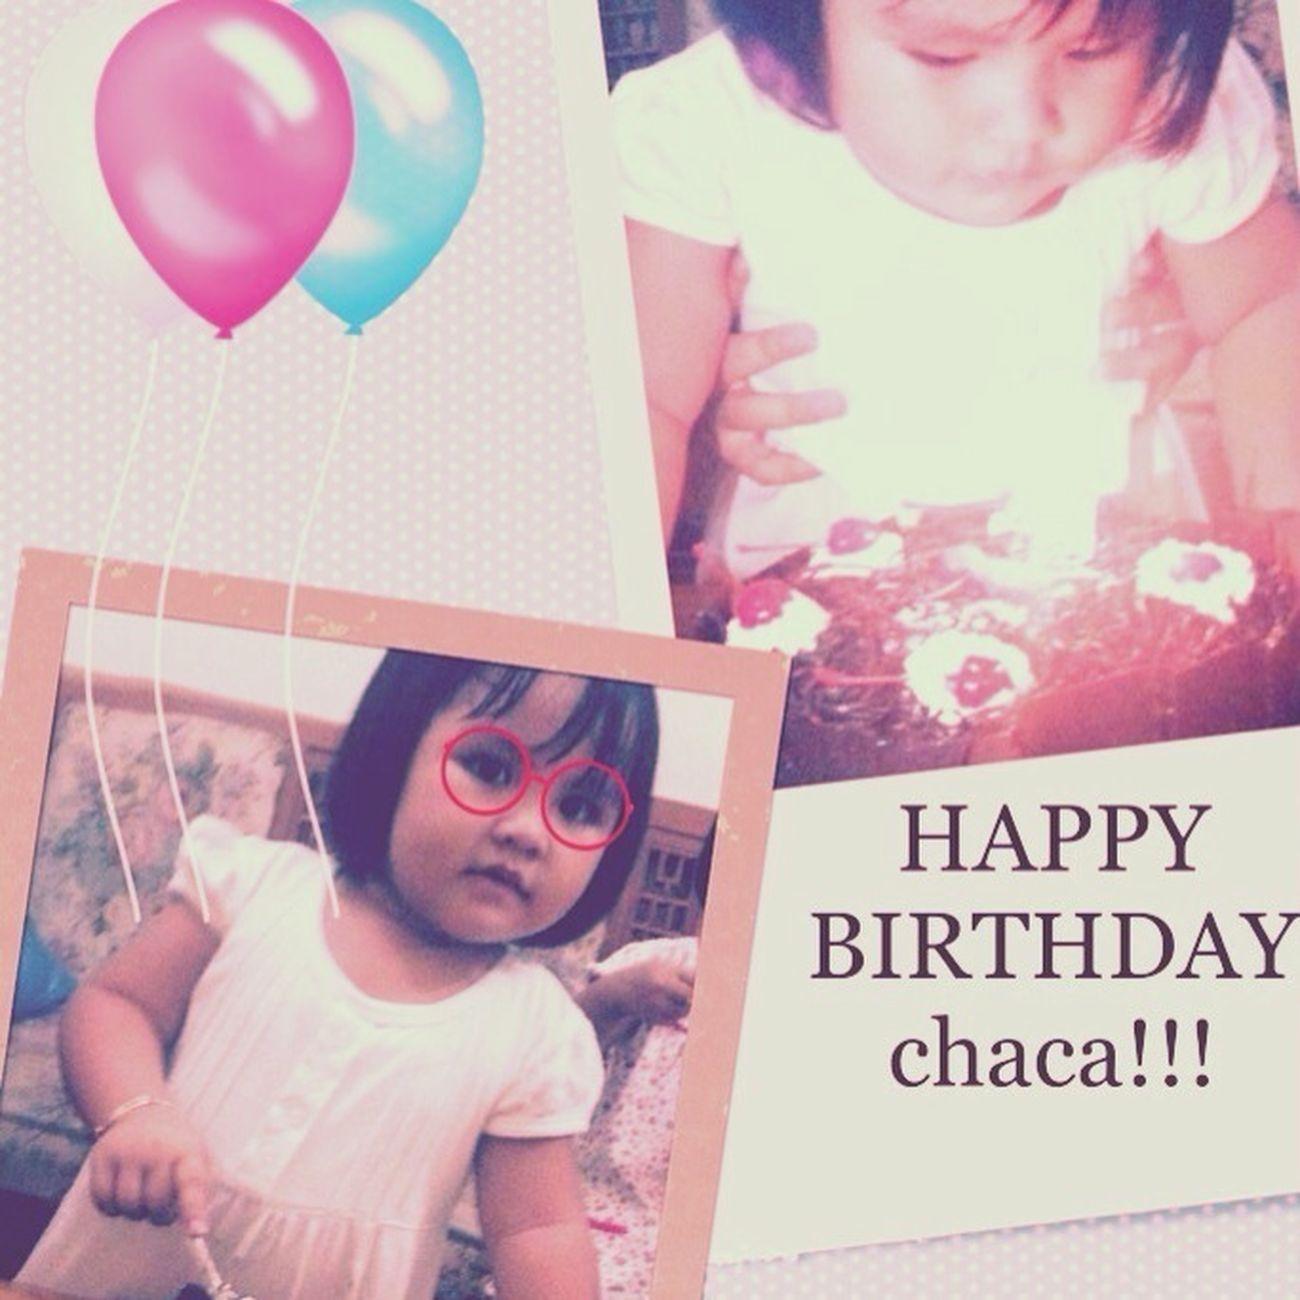 Chaca's Birthday